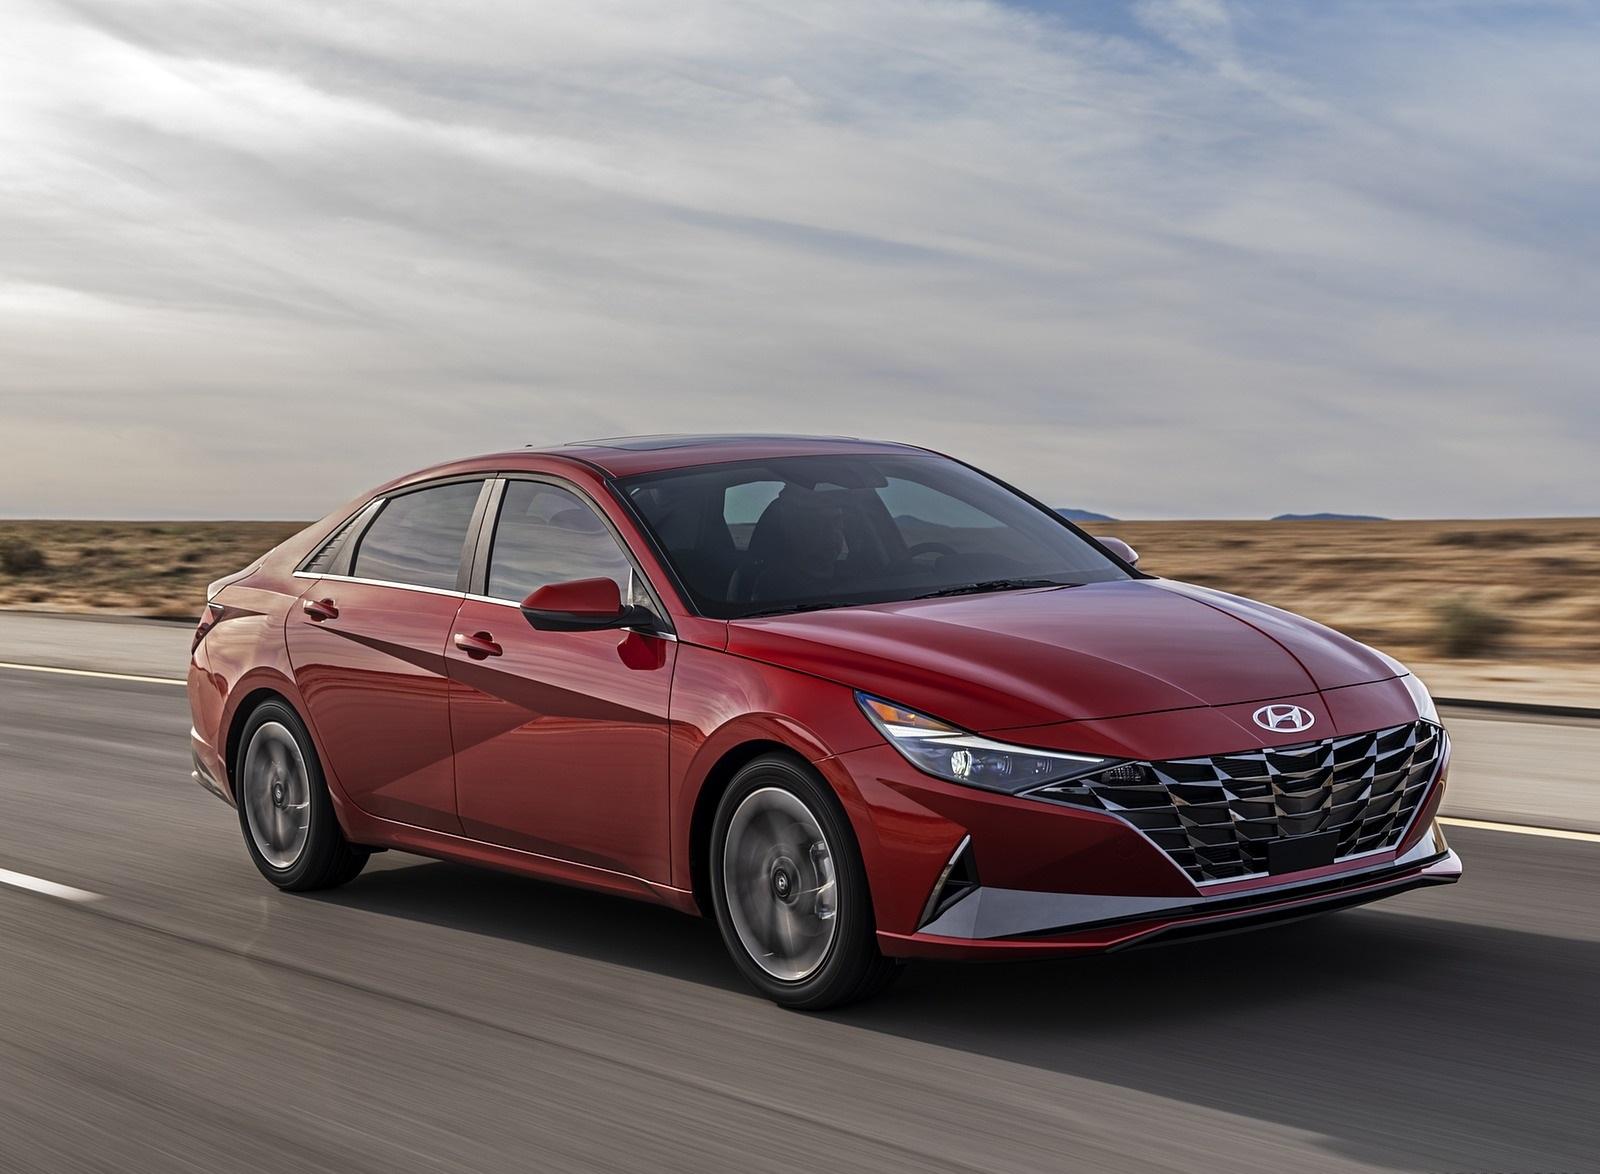 2021 Hyundai Elantra Front Three-Quarter Wallpapers (1)